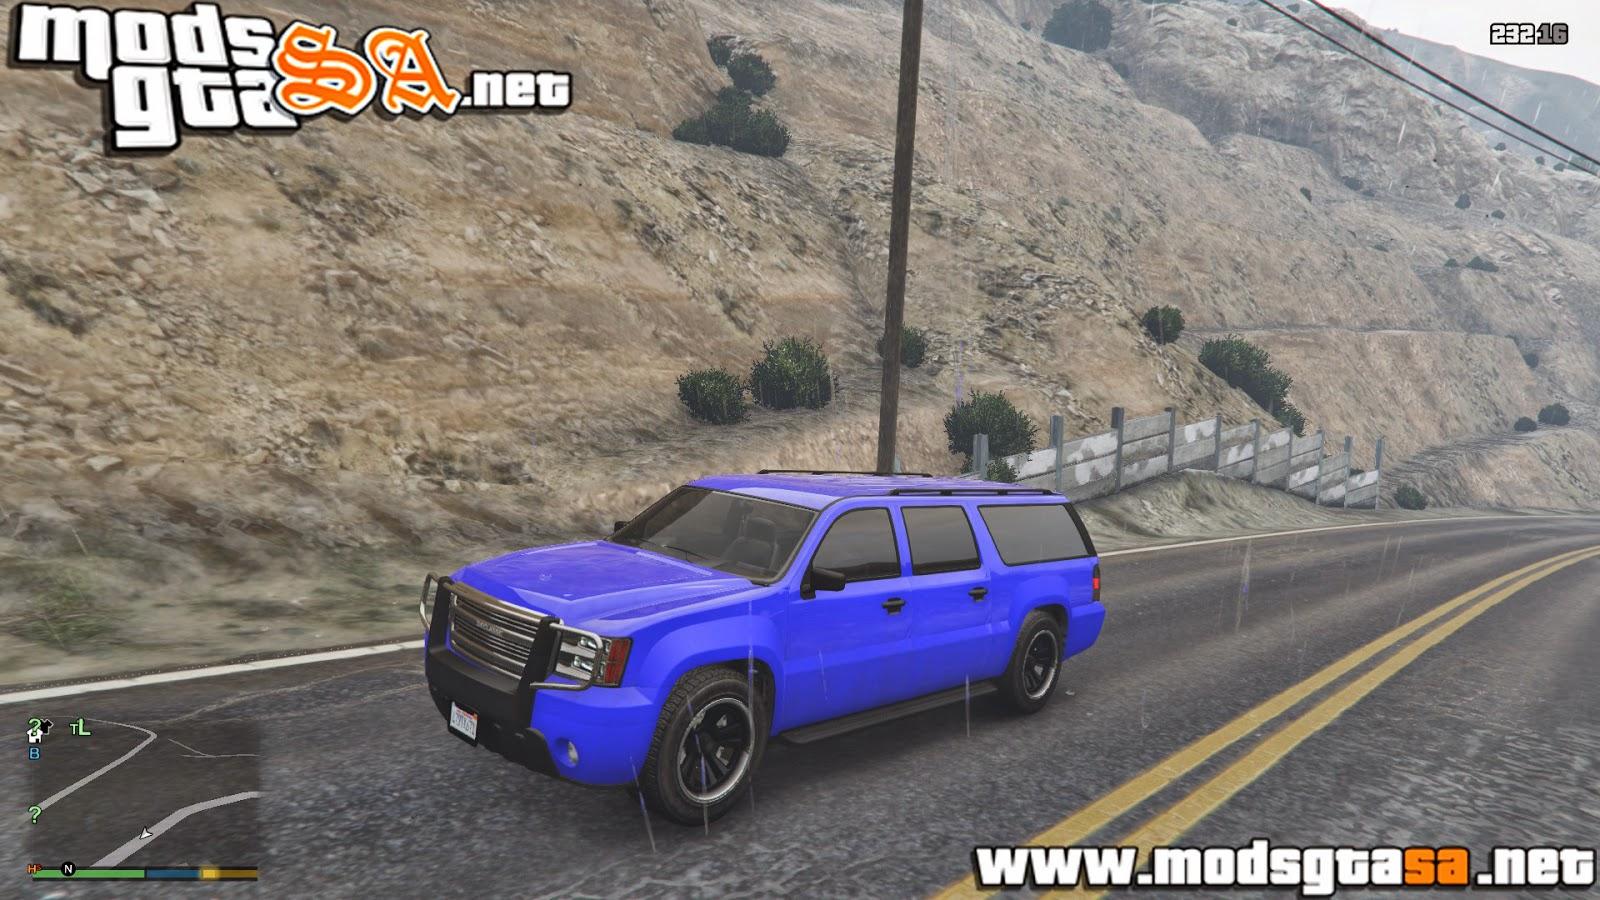 V - Mod Customizar Cor dos Veículos